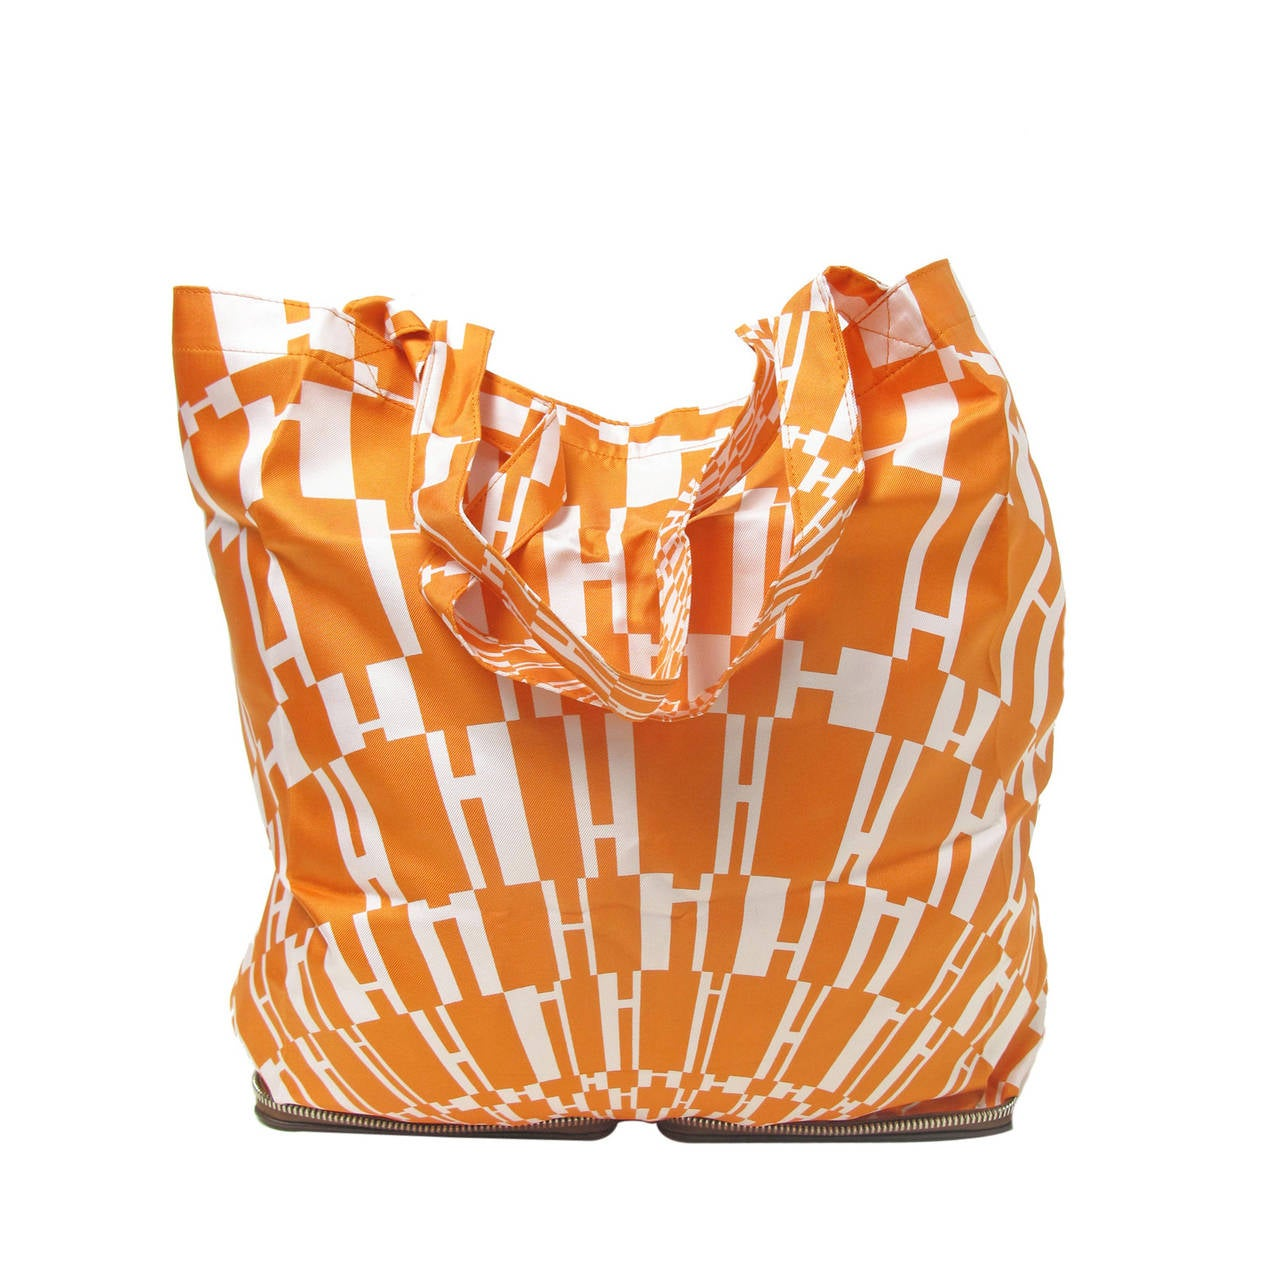 Rare Hermes Orange H Shopper Tote Collapsible Zip Handbag - sale 1